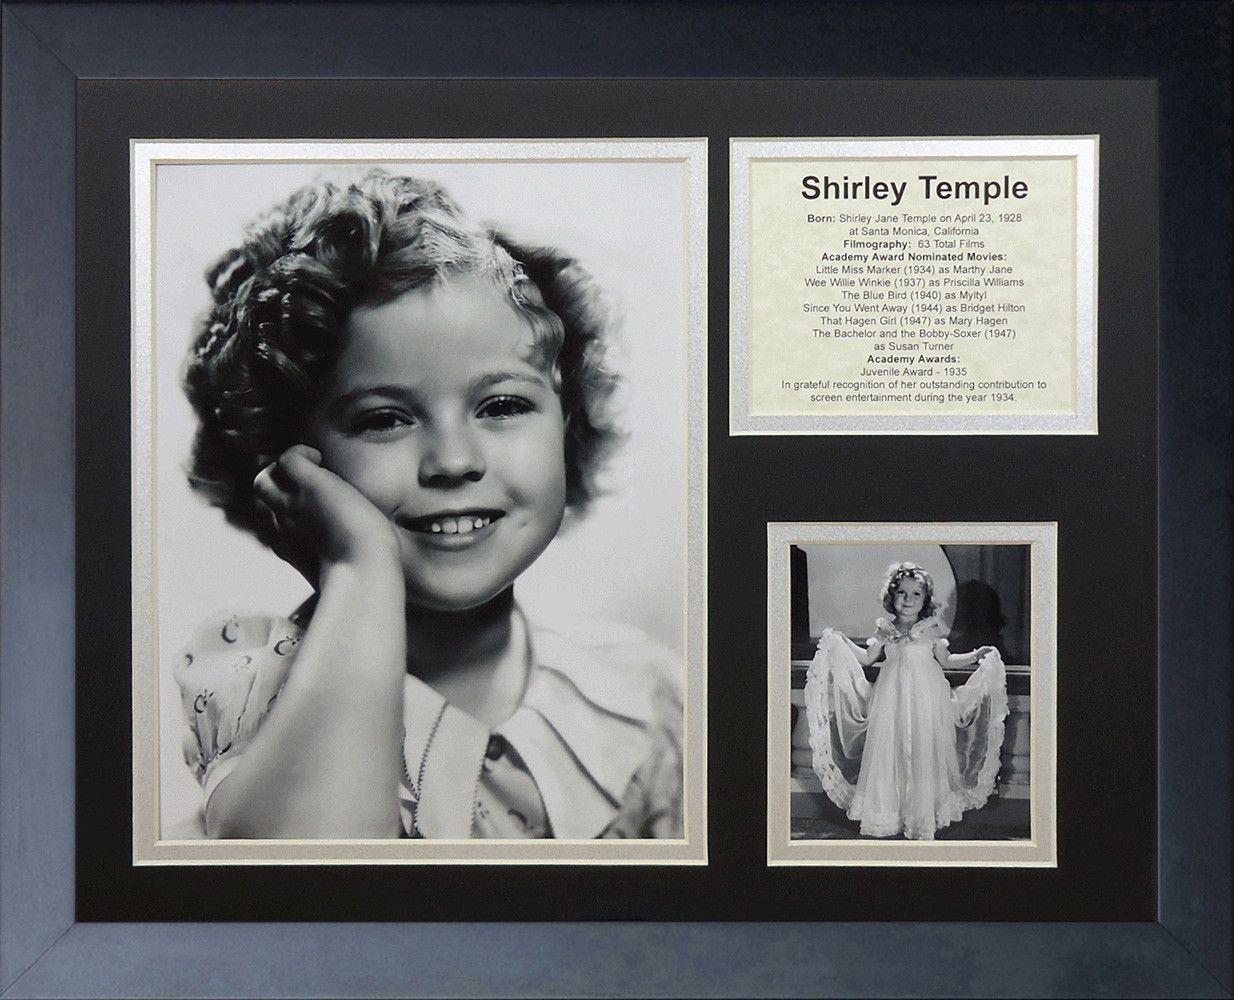 Shirley Temple Framed Memorabilia